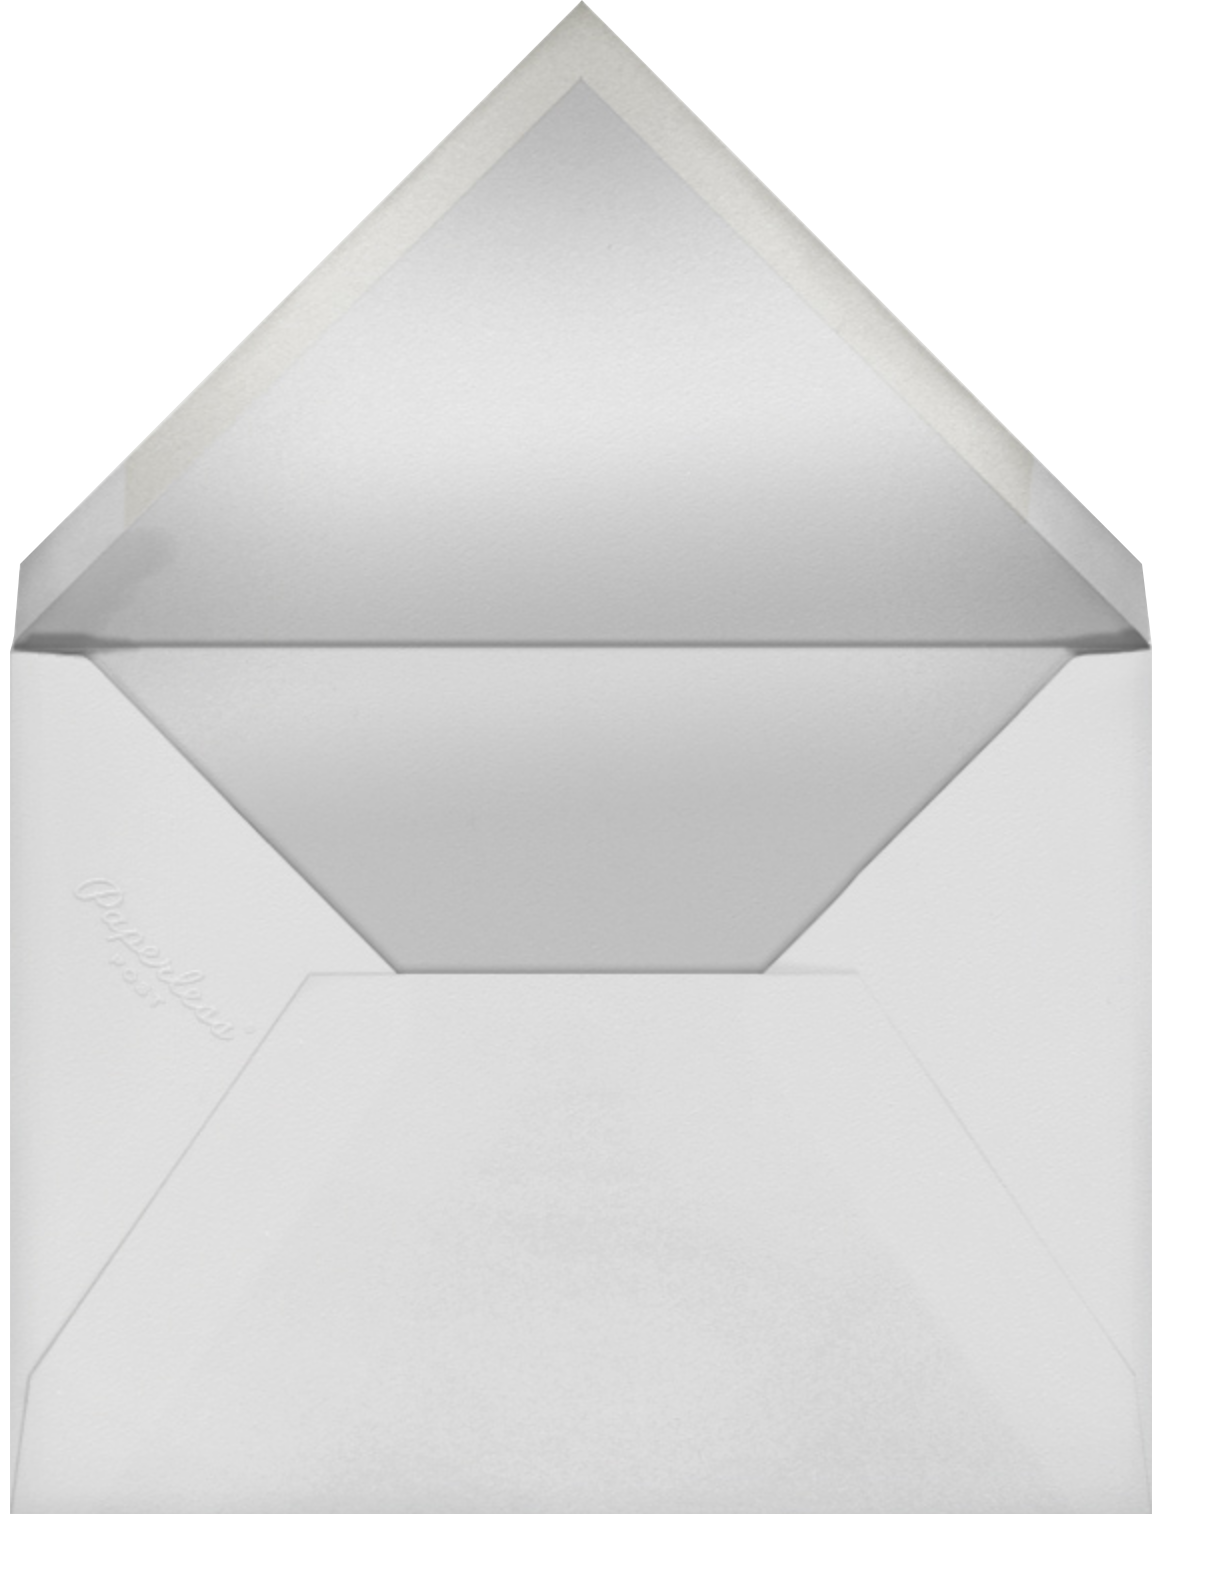 Nixon Border (Program) - Jonathan Adler - Menus and programs - envelope back